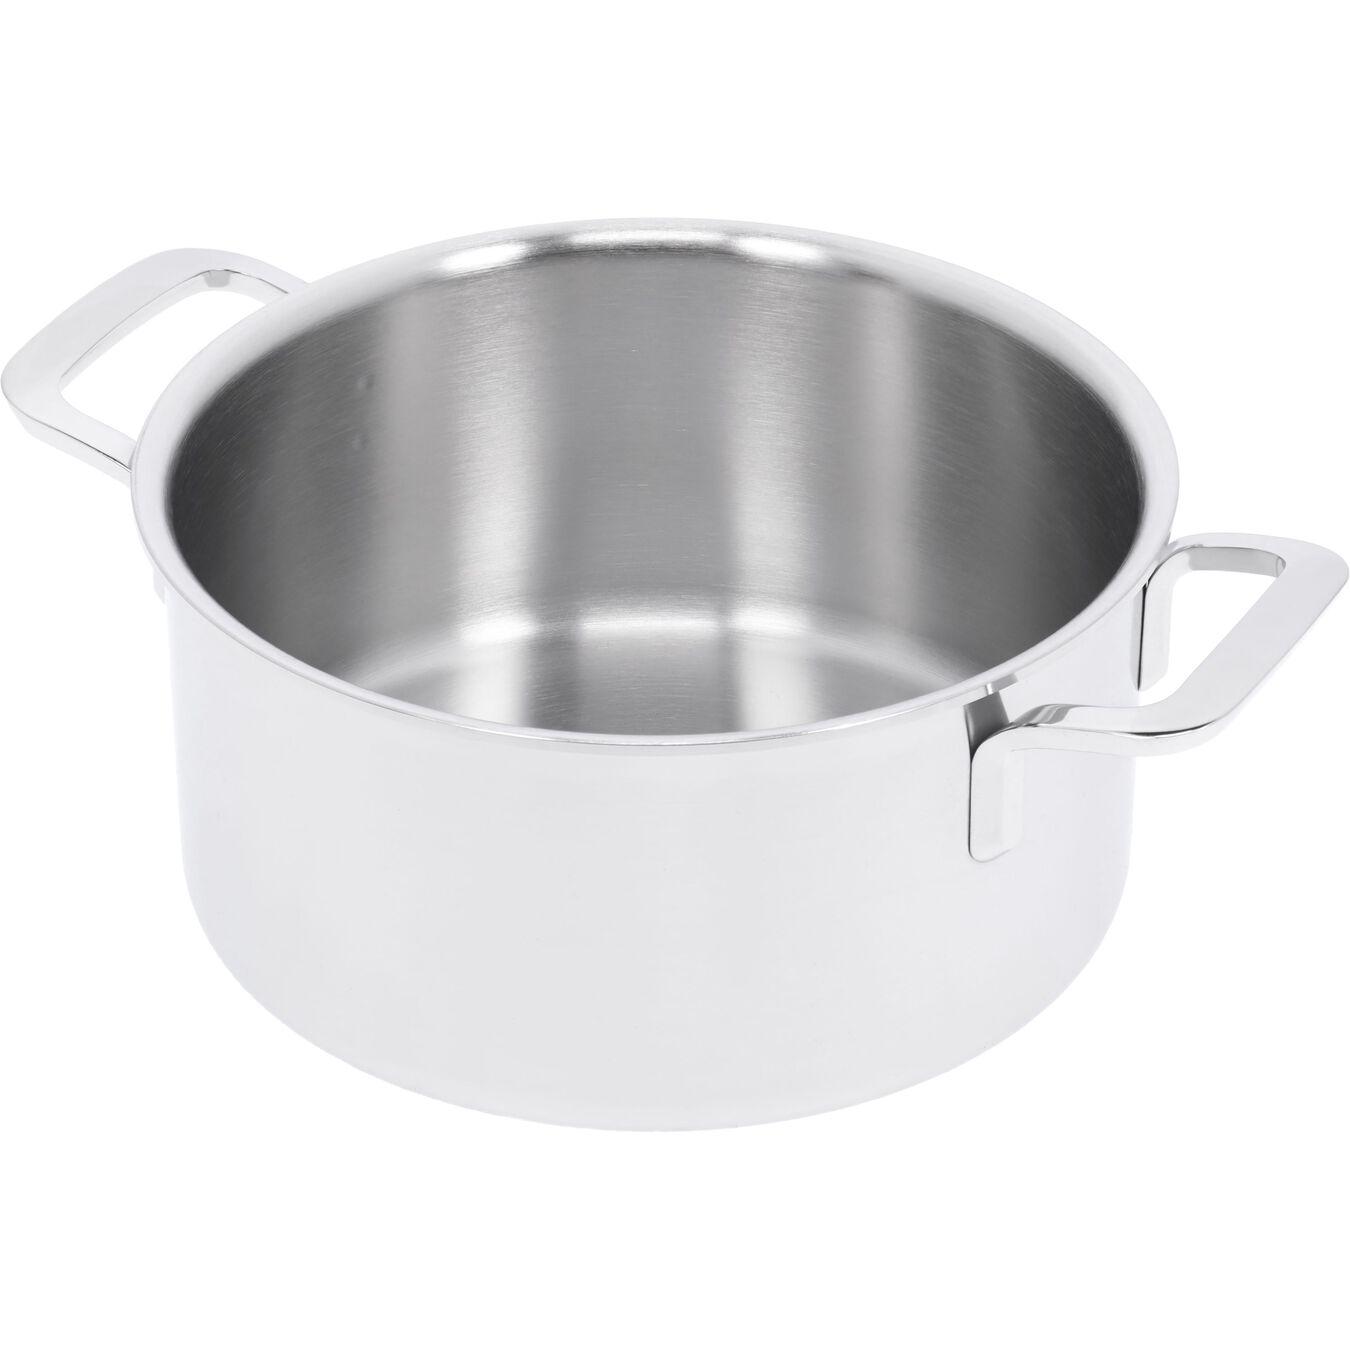 Kookpot met dubbelwandig deksel, 22 cm / 4 l,,large 2